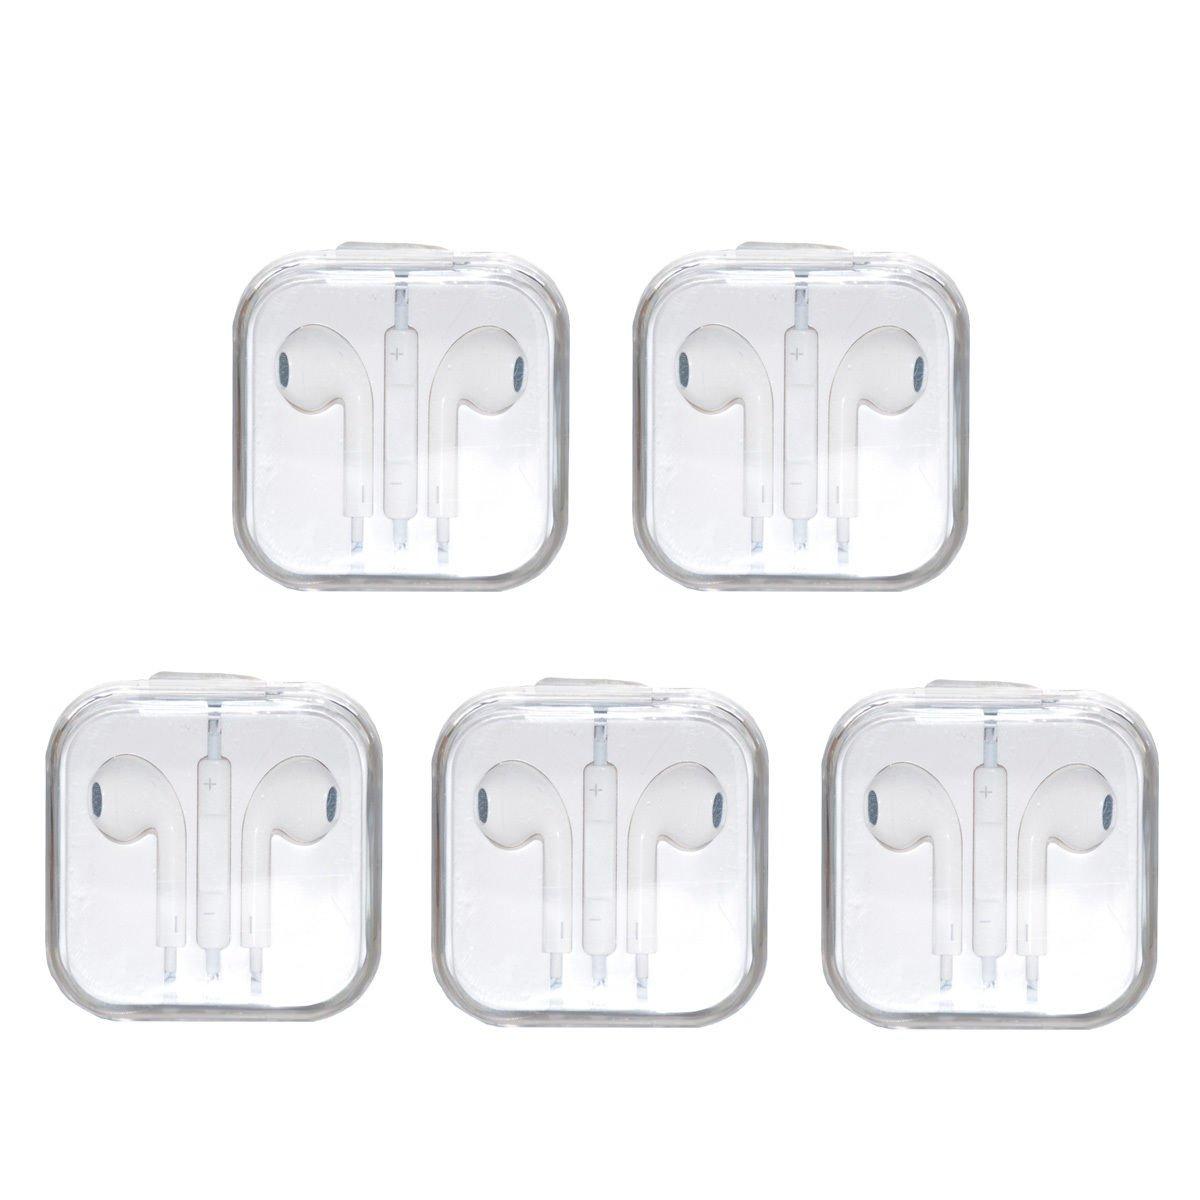 5x Earphone Earbud Headphone w/ Volume Control For Apple iPhone 5 5s 6 6S ipod